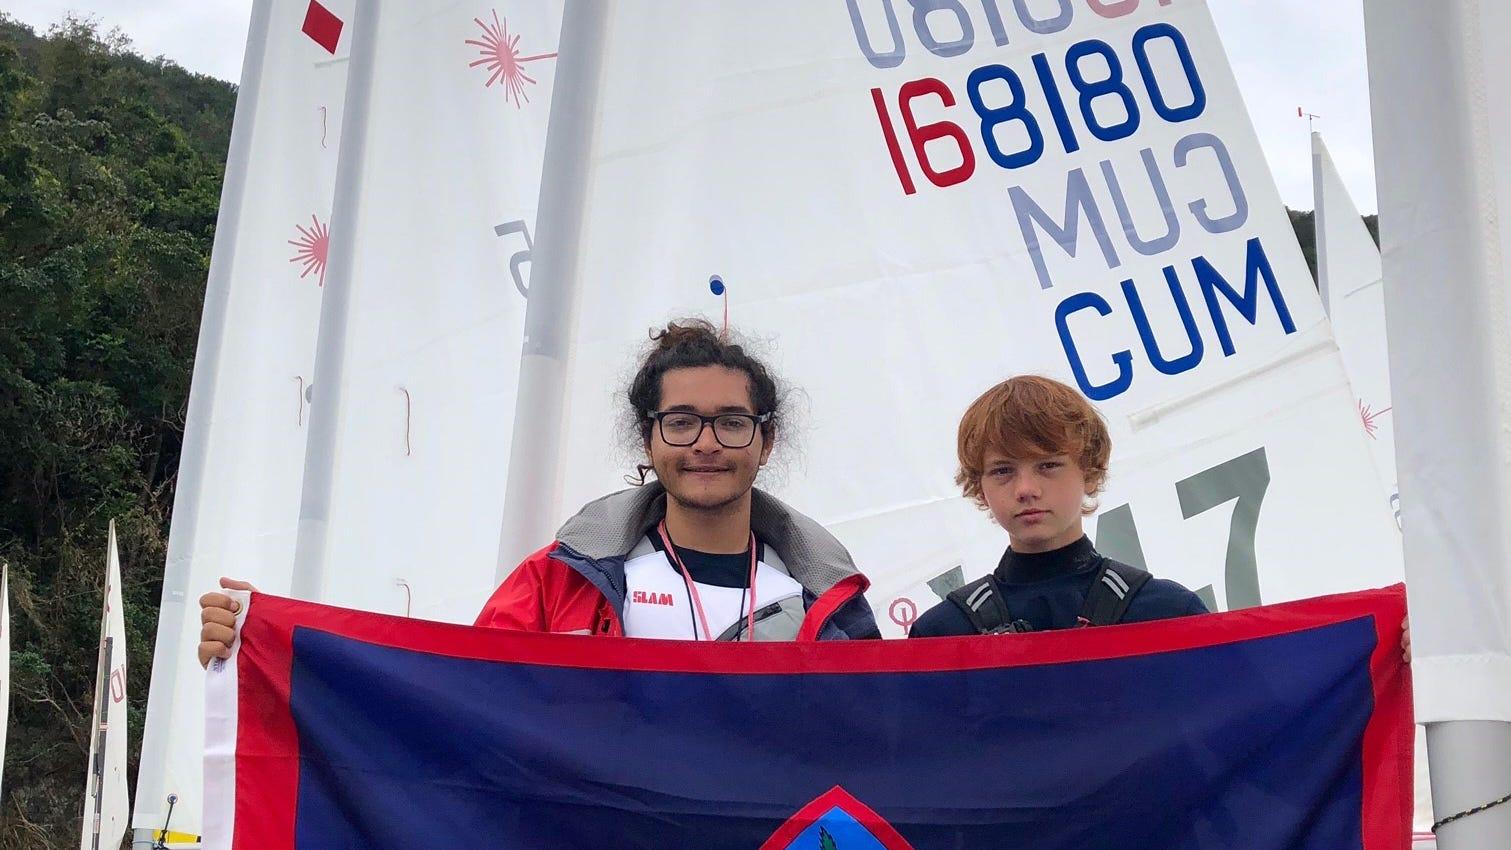 Guam teen competing in Hong Kong sailing event